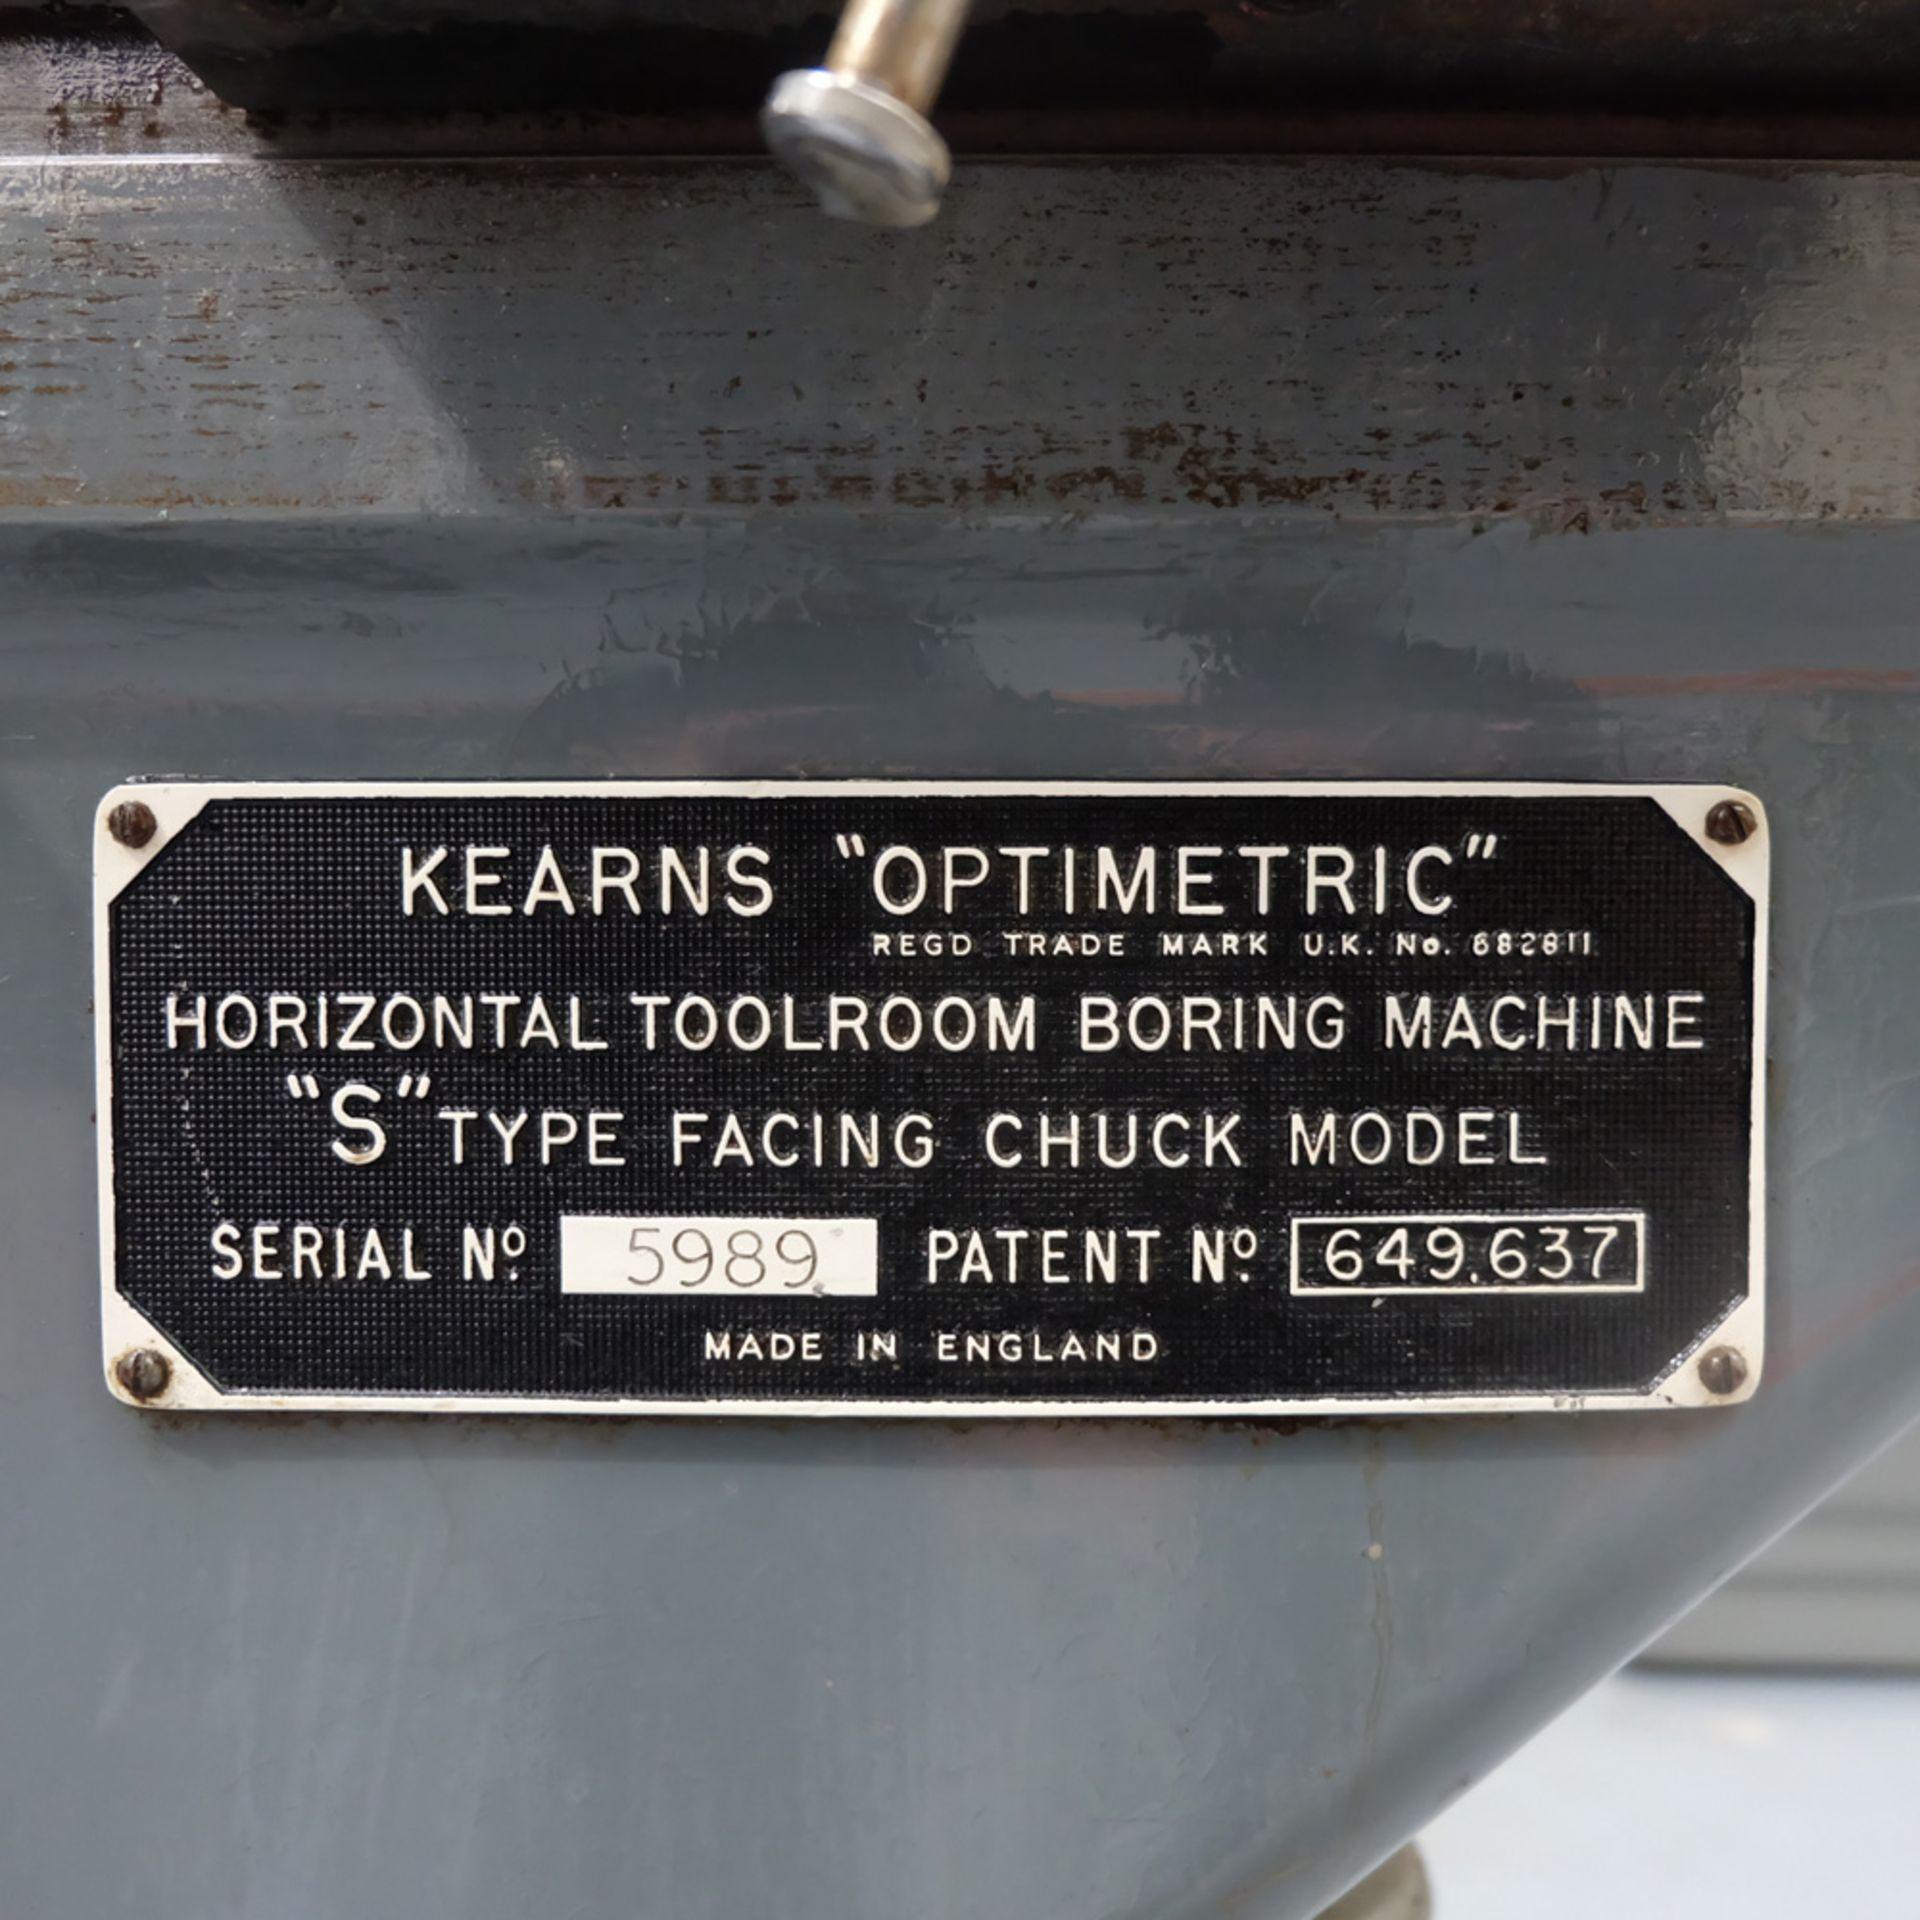 "Kearns S Type Facing Chuck Model Horizontal Boring Machine. Facing Chuck Capacity 8"". - Image 2 of 18"